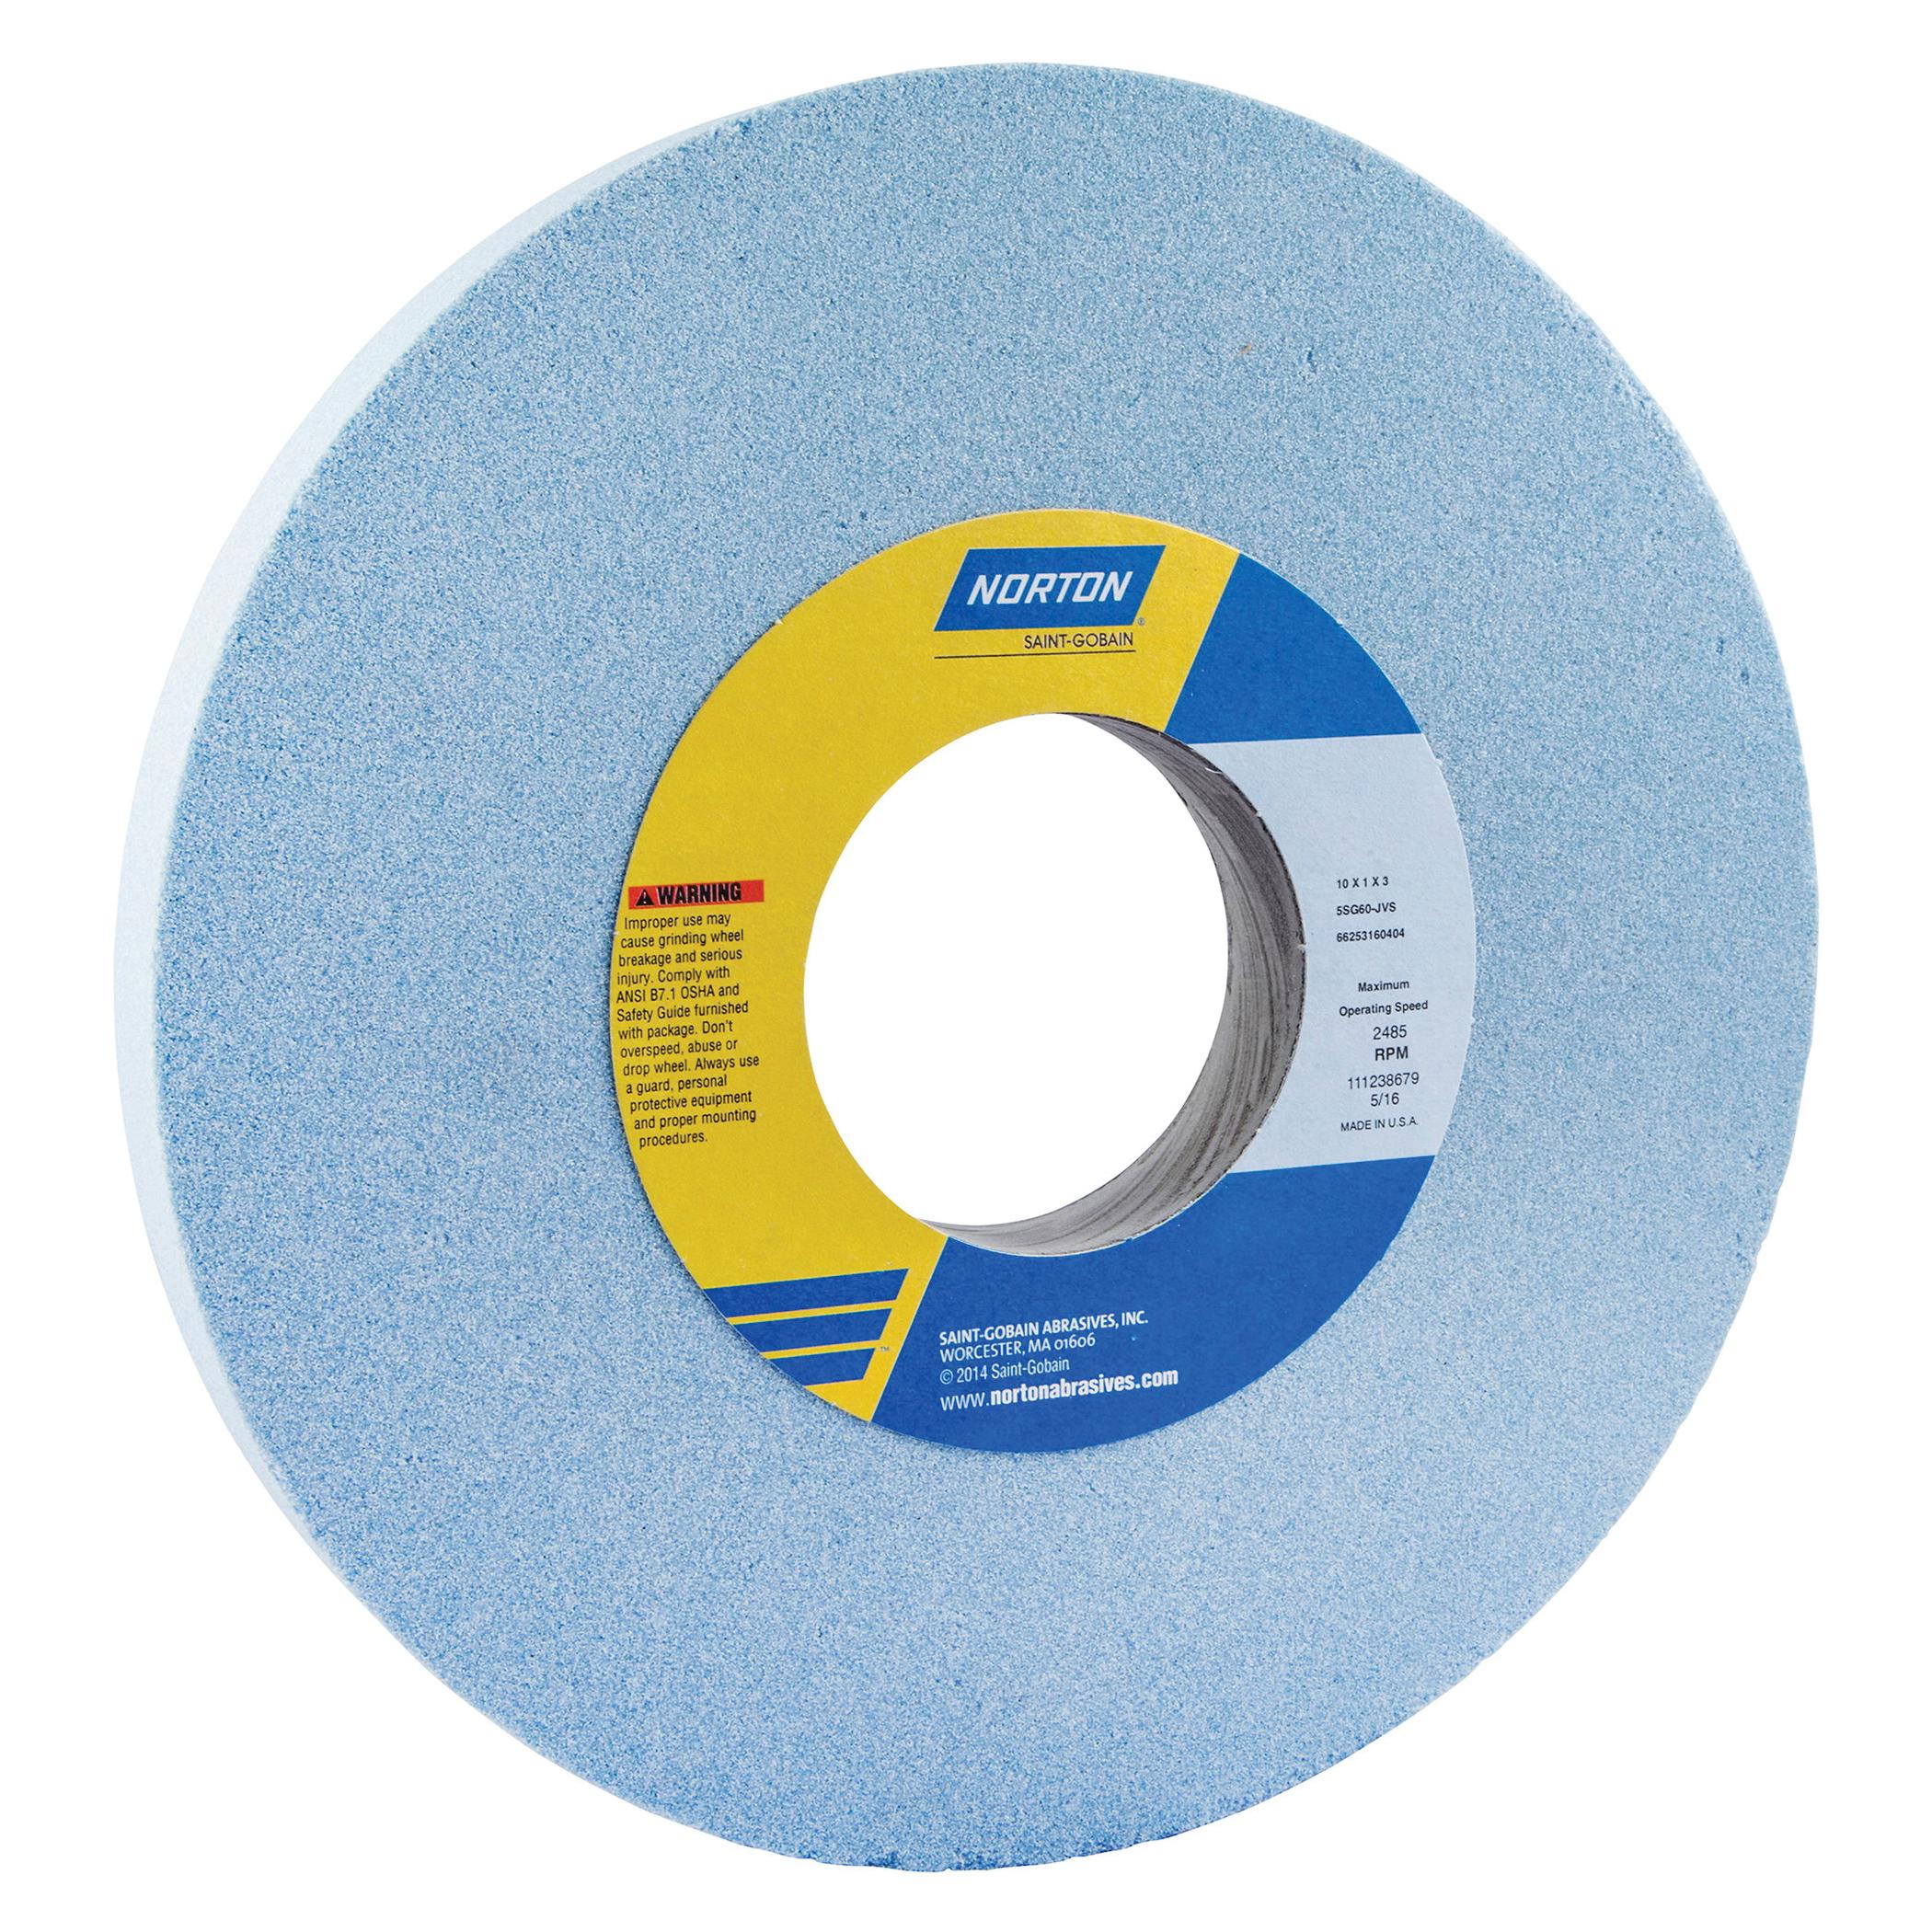 Norton® 66253160405 5SG Straight Toolroom Wheel, 10 in Dia x 1 in THK, 3 in Center Hole, 60 Grit, Ceramic Alumina/Friable Aluminum Oxide Abrasive